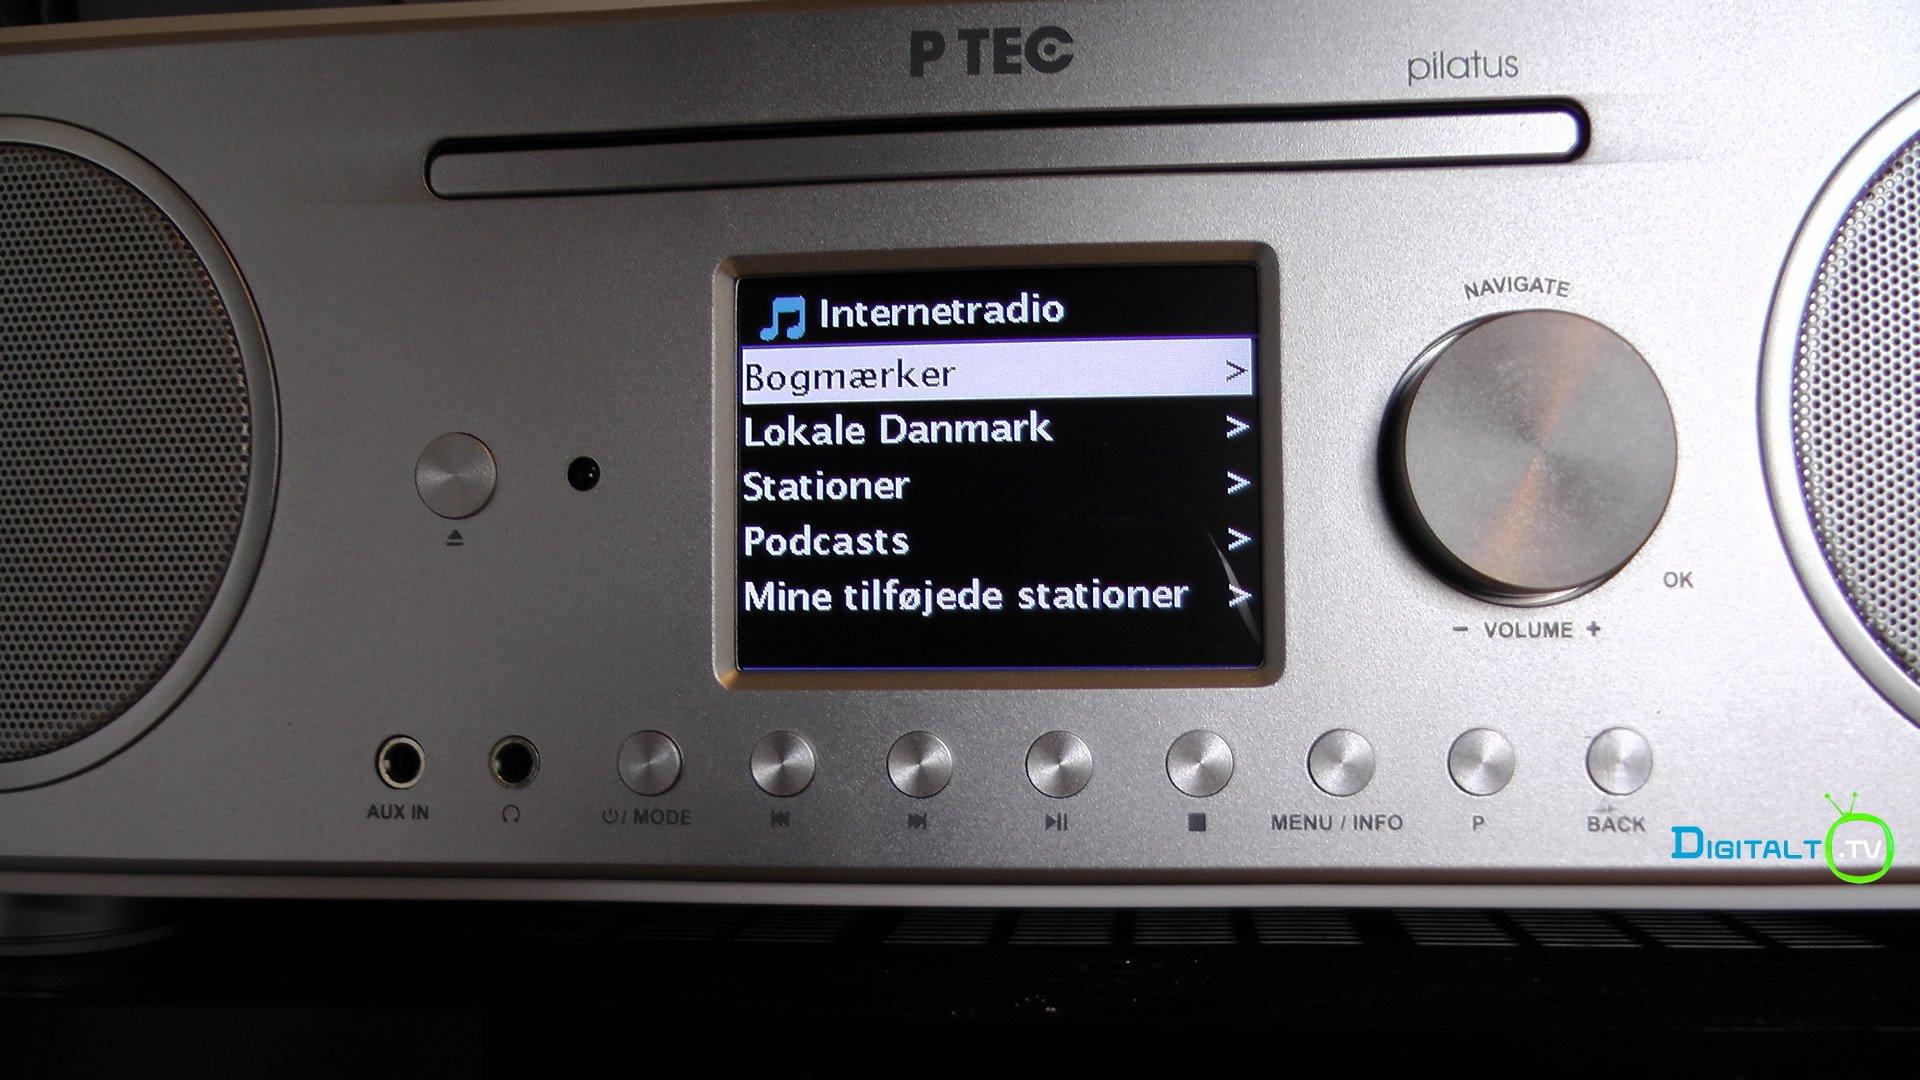 Pilatus Internetradio menu